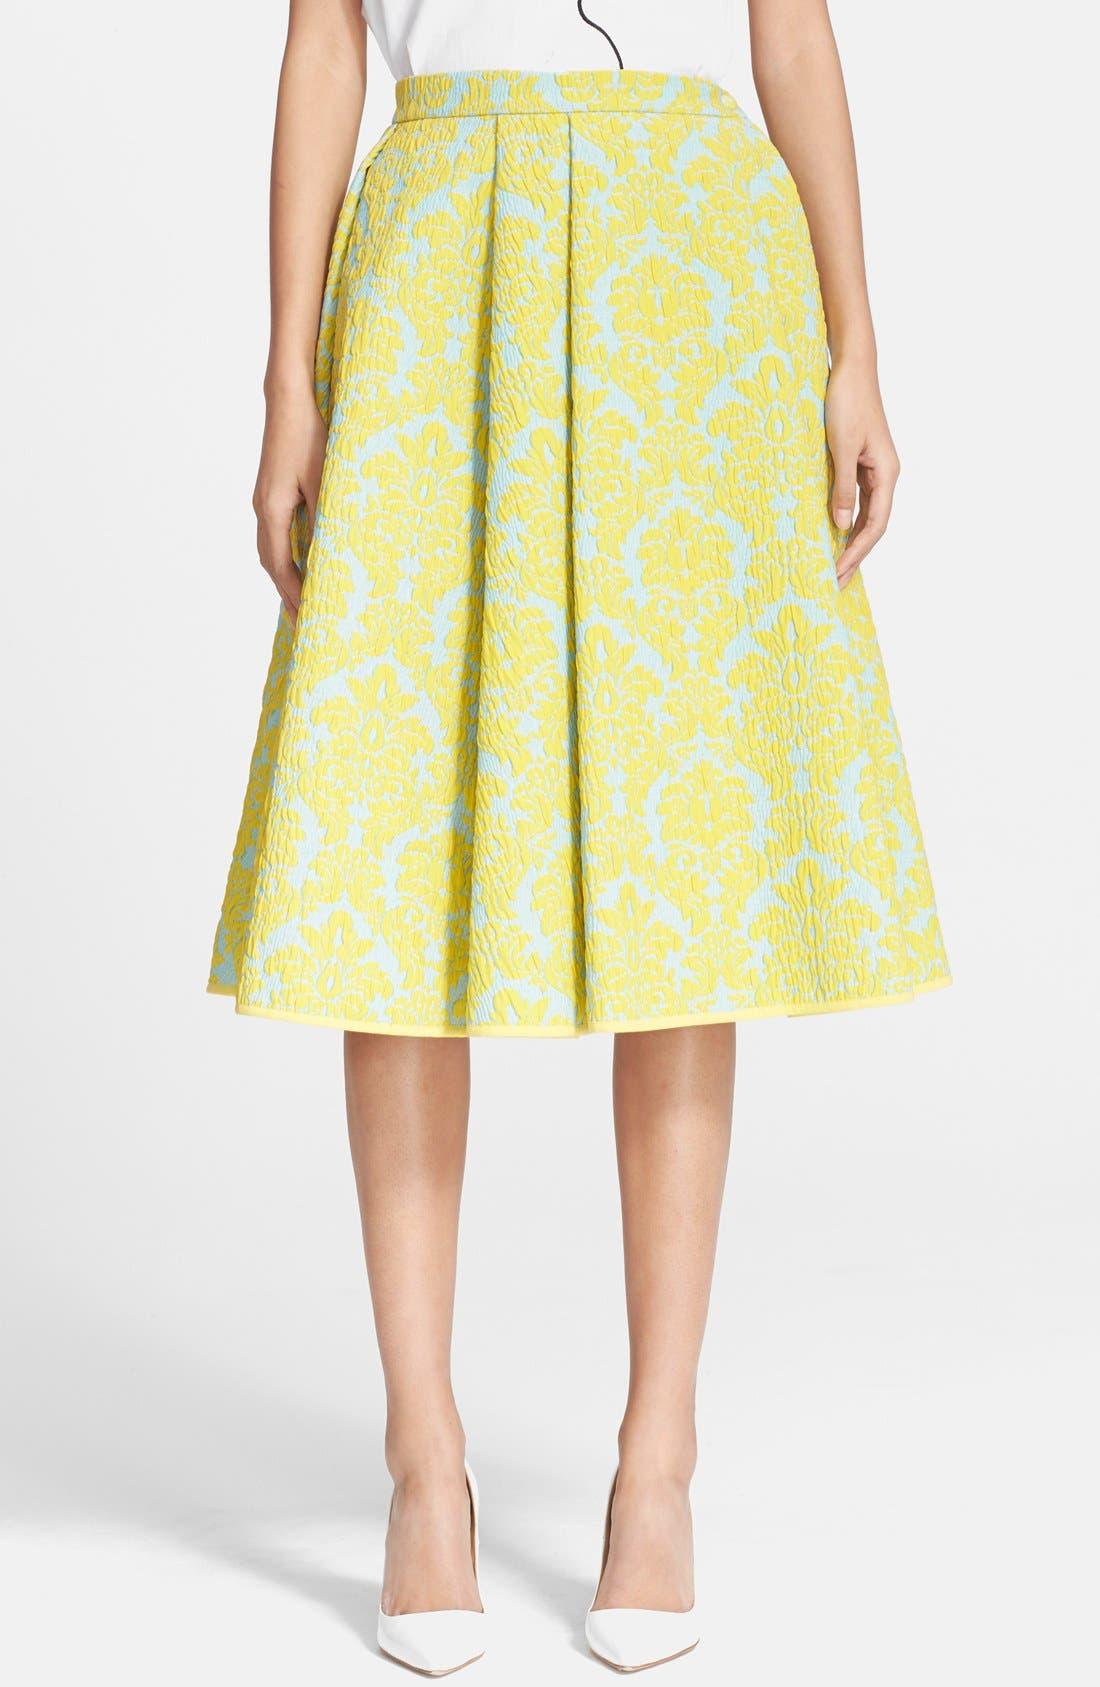 Alternate Image 1 Selected - VIVETTA 'Candy' Brocade A-Line Skirt